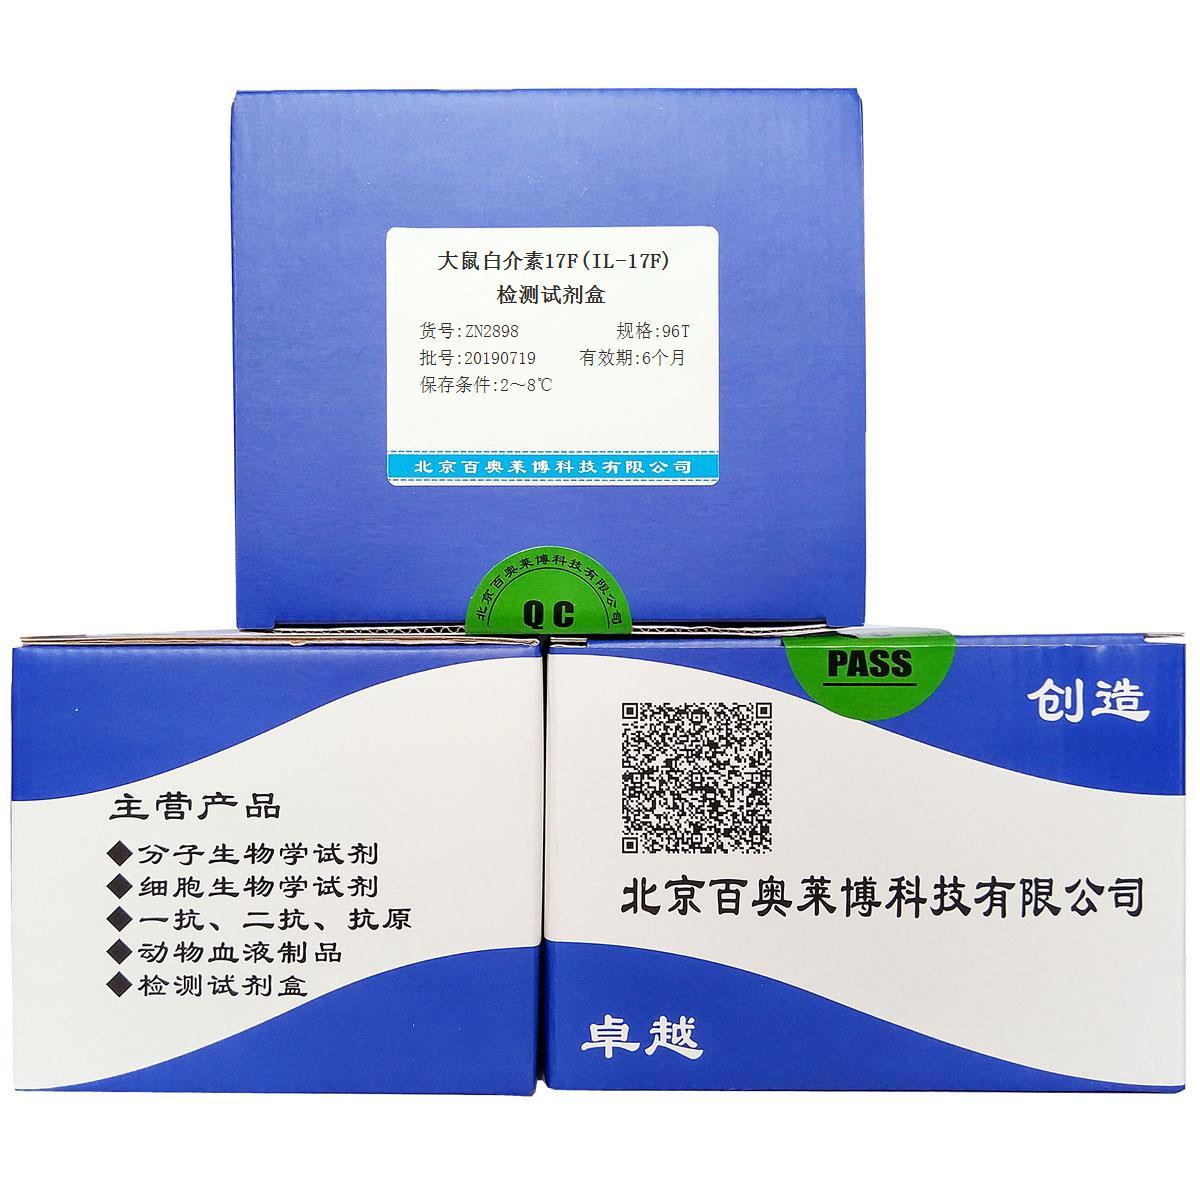 大鼠白介素17F(IL-17F)检测试剂盒